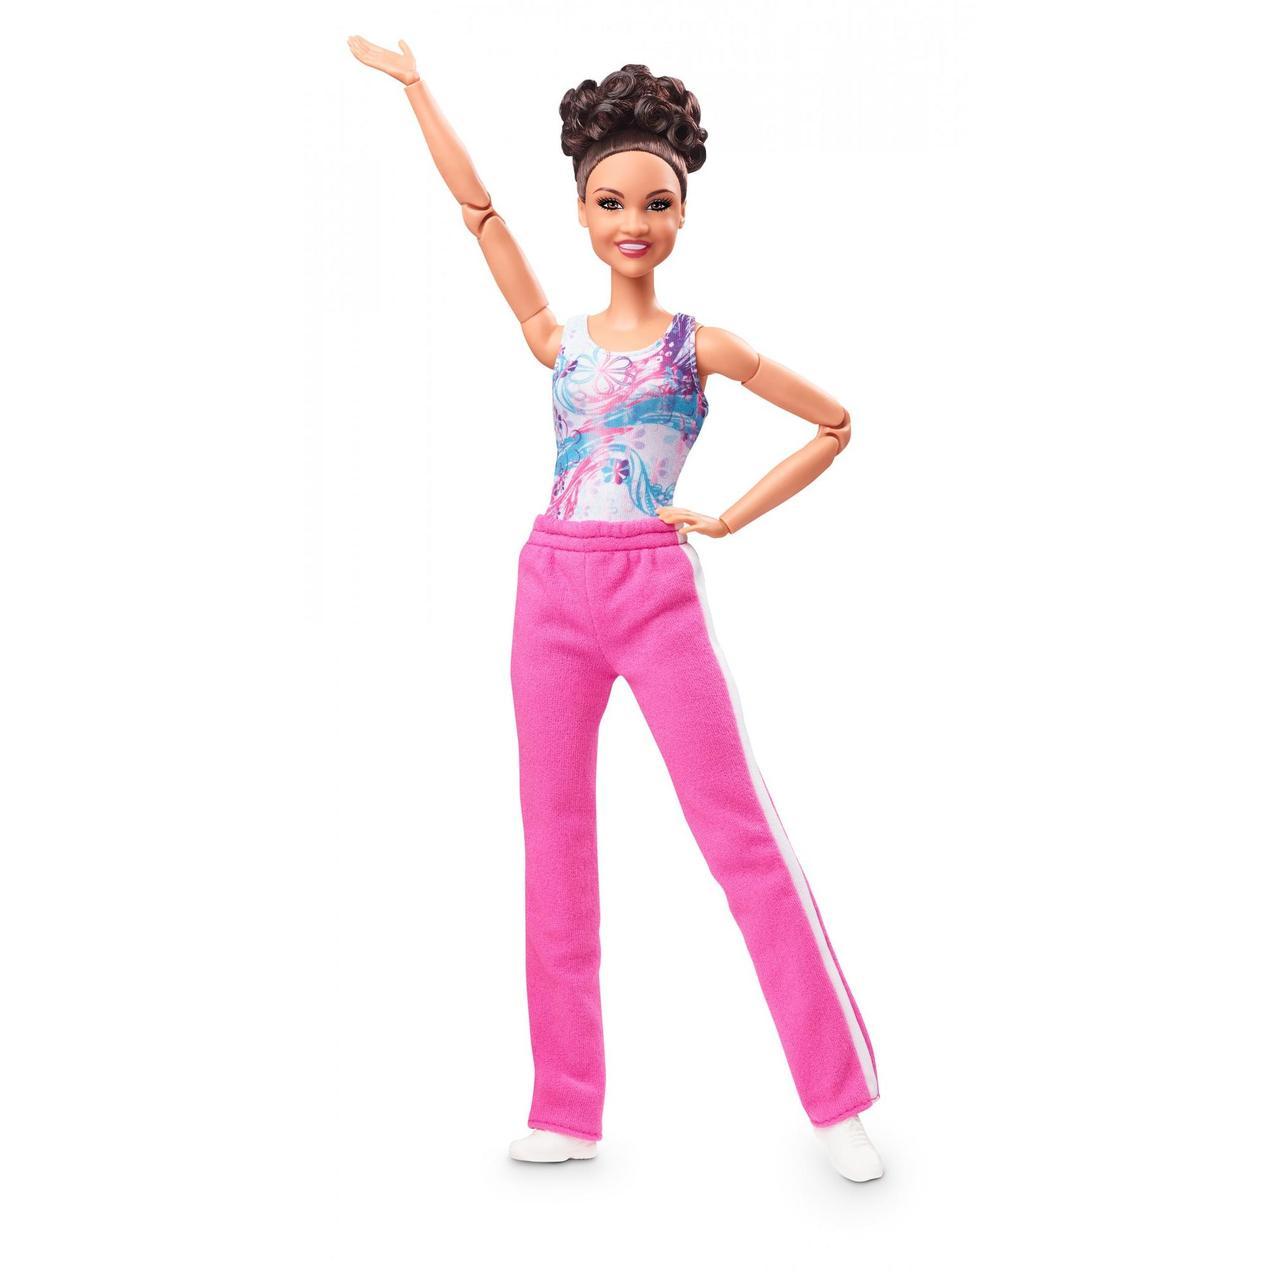 Barbie Барби гимнастка Лаура Фернандез Laurie Hernandez Gymnast Doll